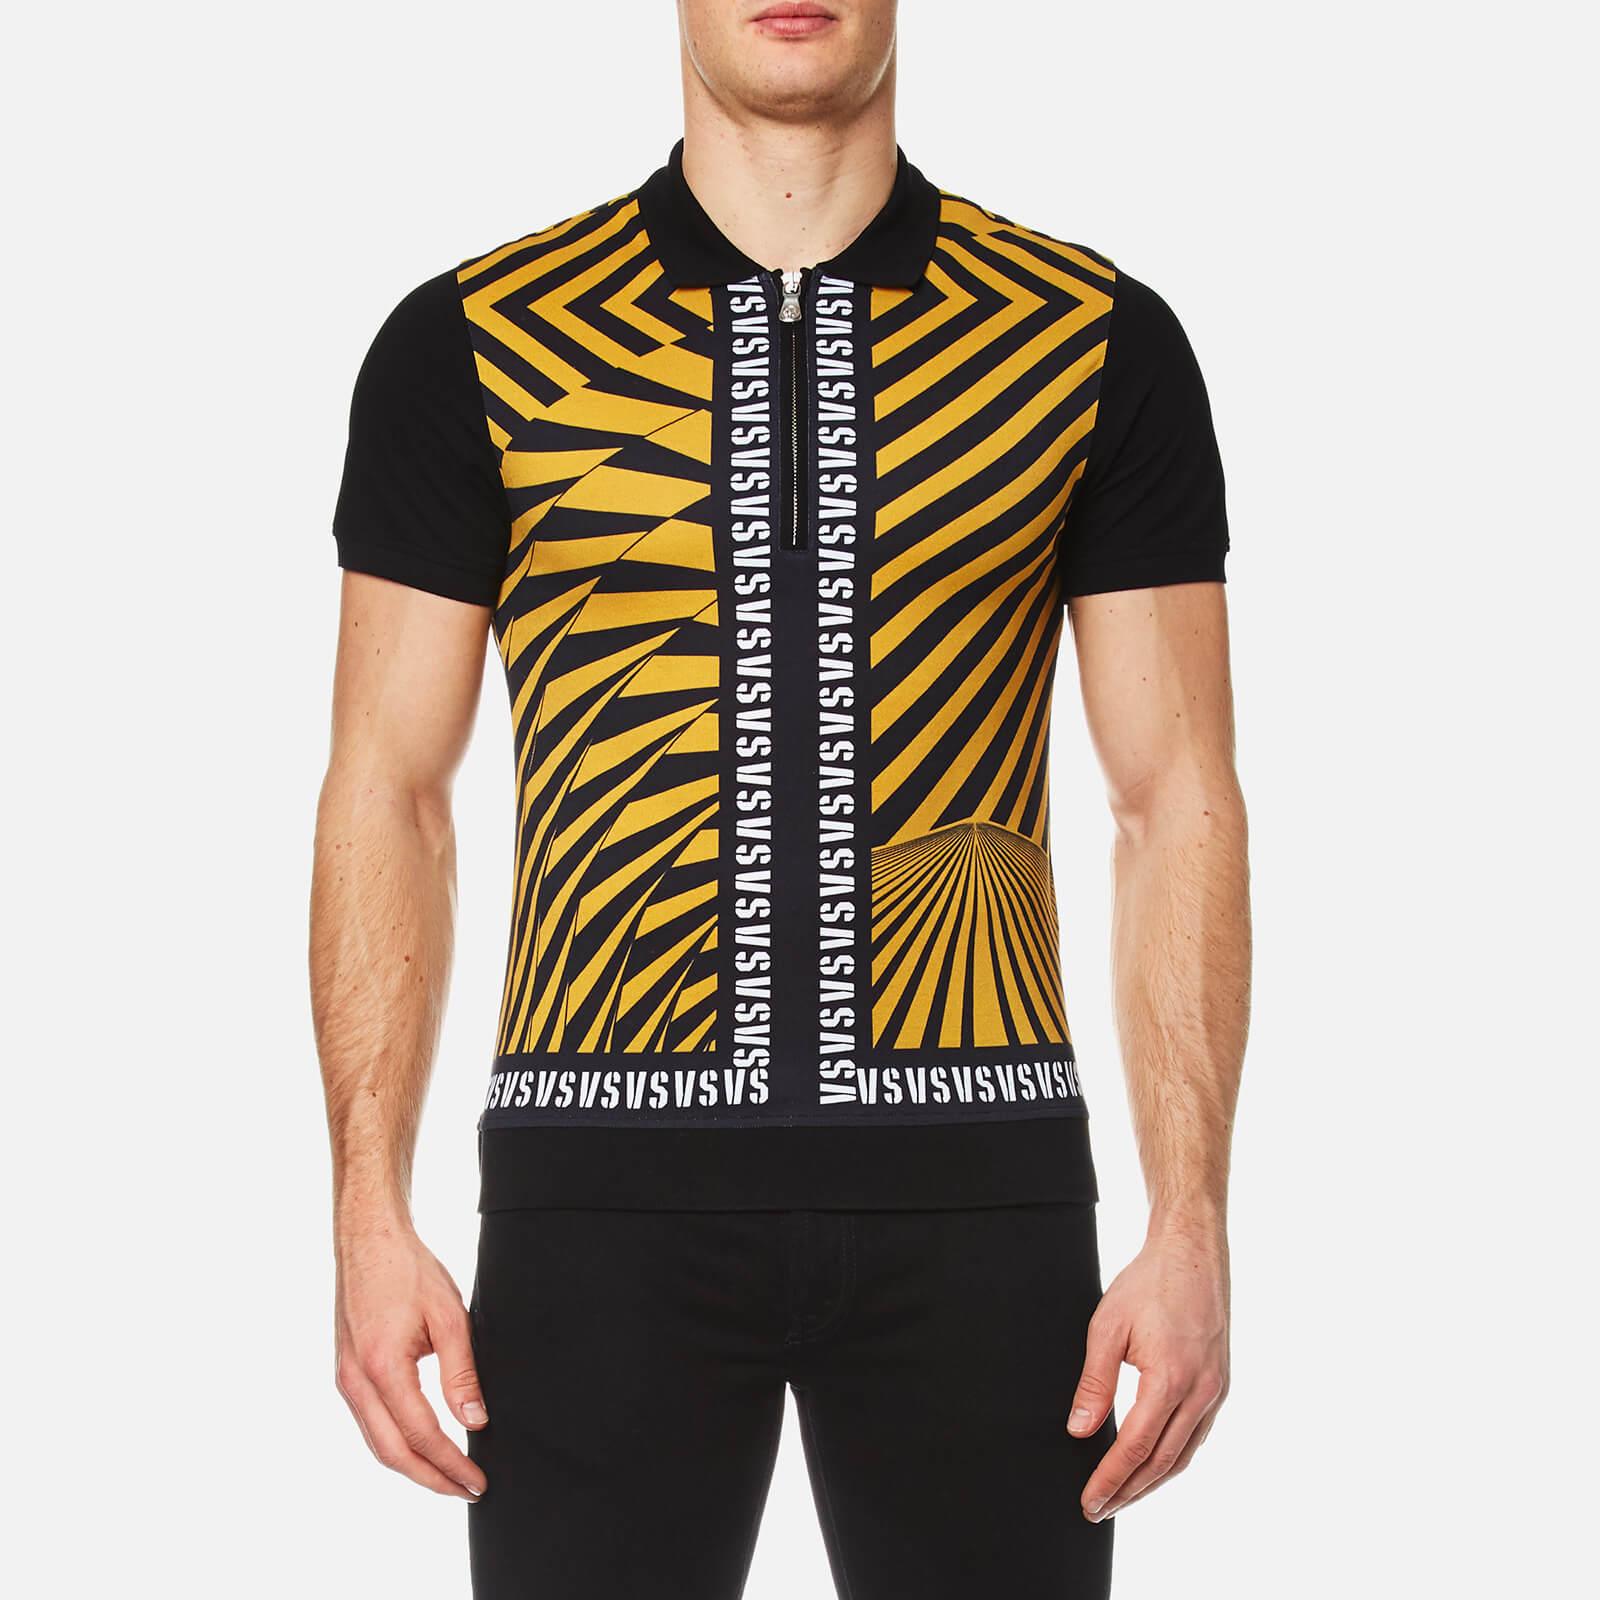 d81b930b Versus Versace Men's All Over Printed Polo Shirt - Yellow/Black